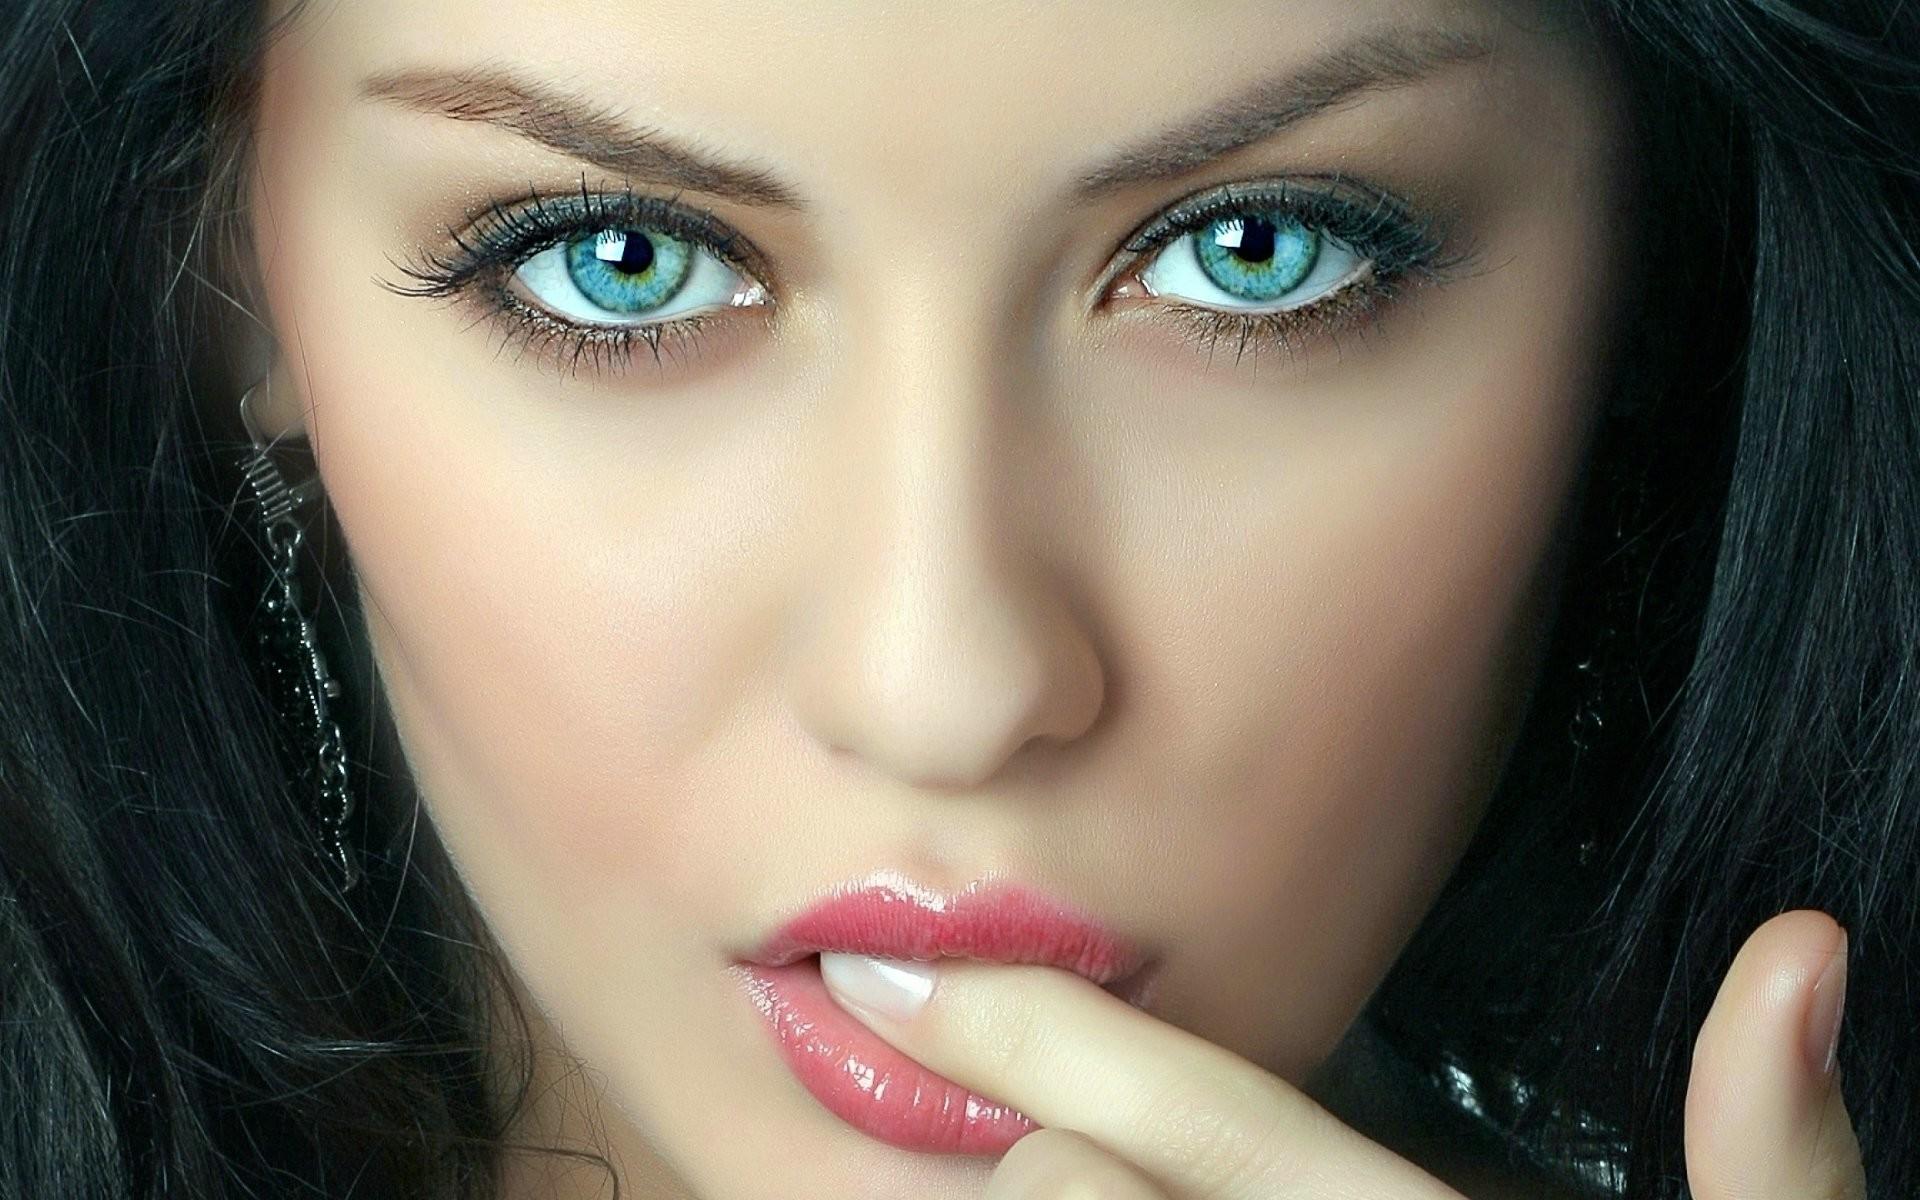 Download Wallpaper Girl, Face, Eyes, Hair, Pretty Full 1920×1200